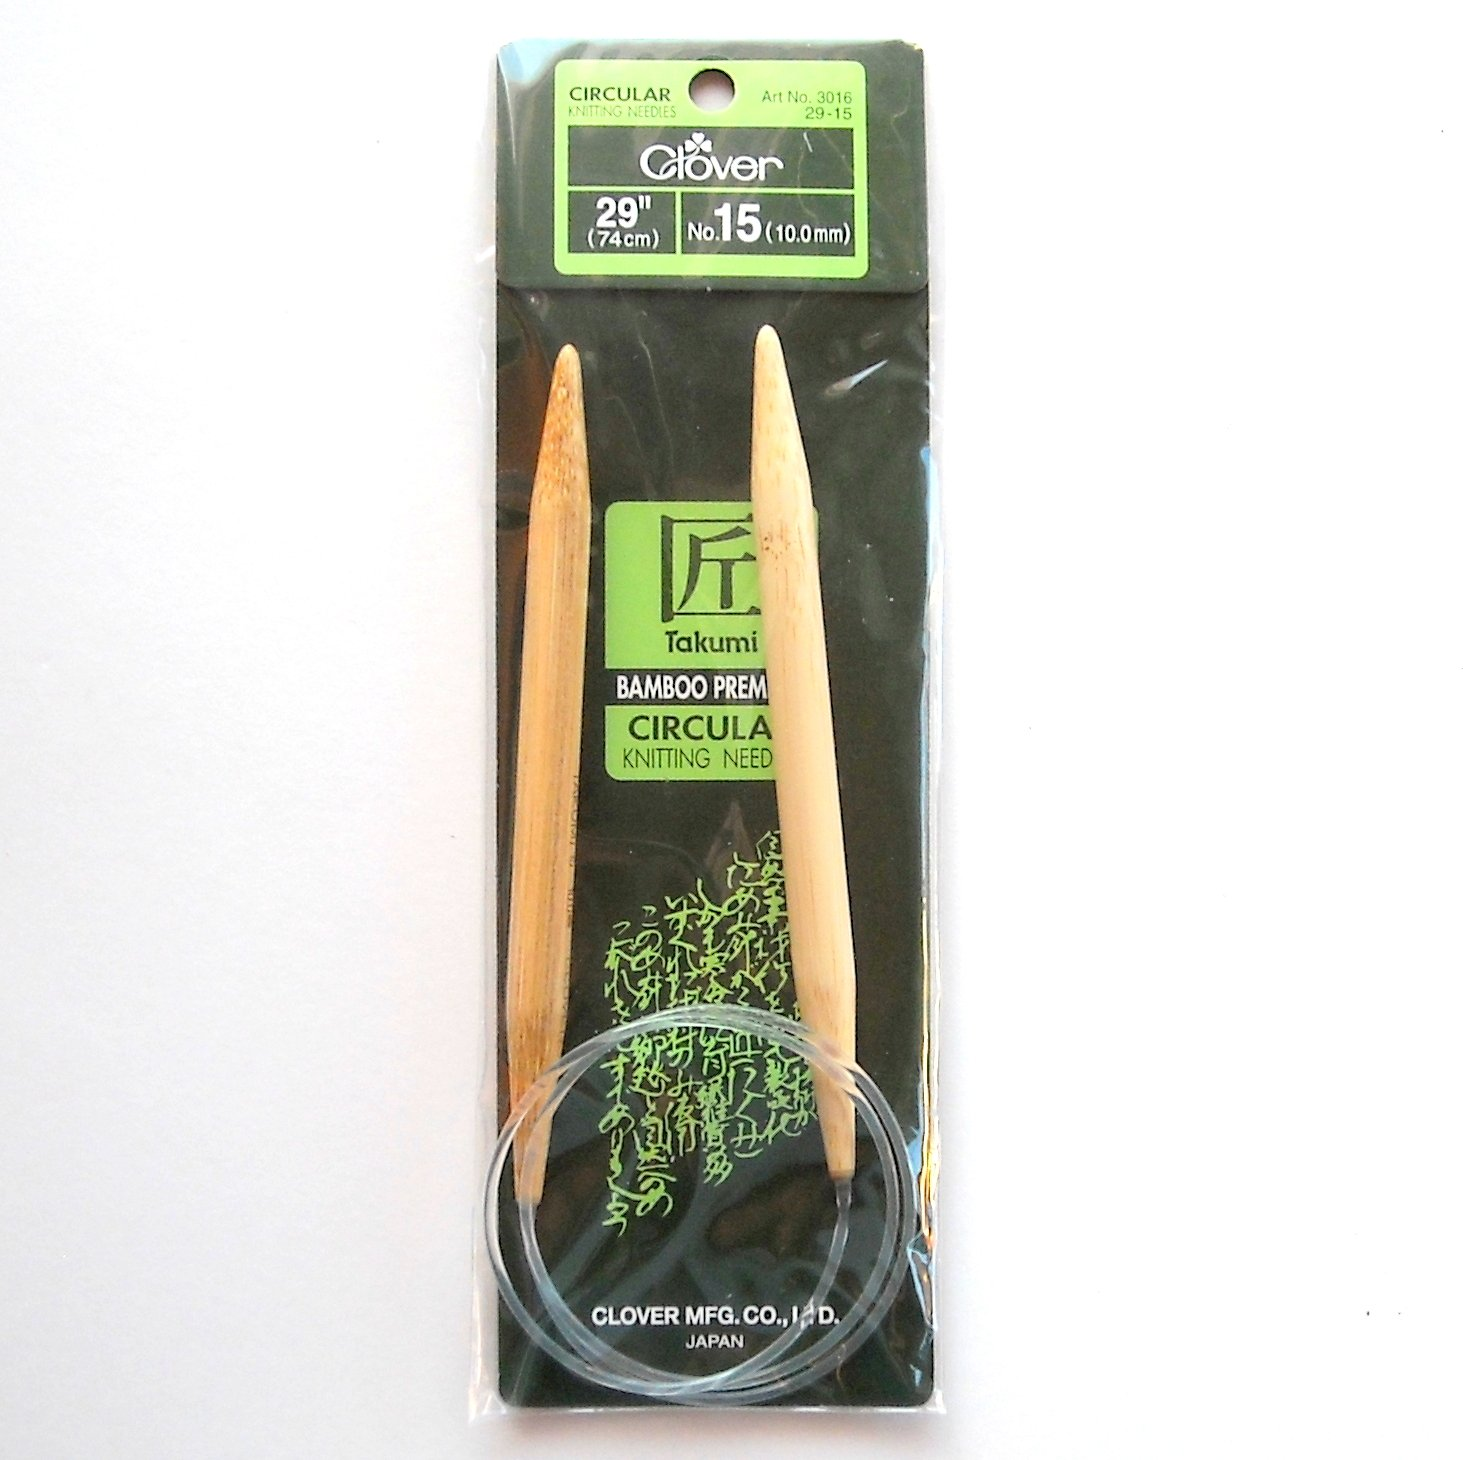 29 Inch Clover Takumi Bamboo Premium Circular Knitting Needles No 15